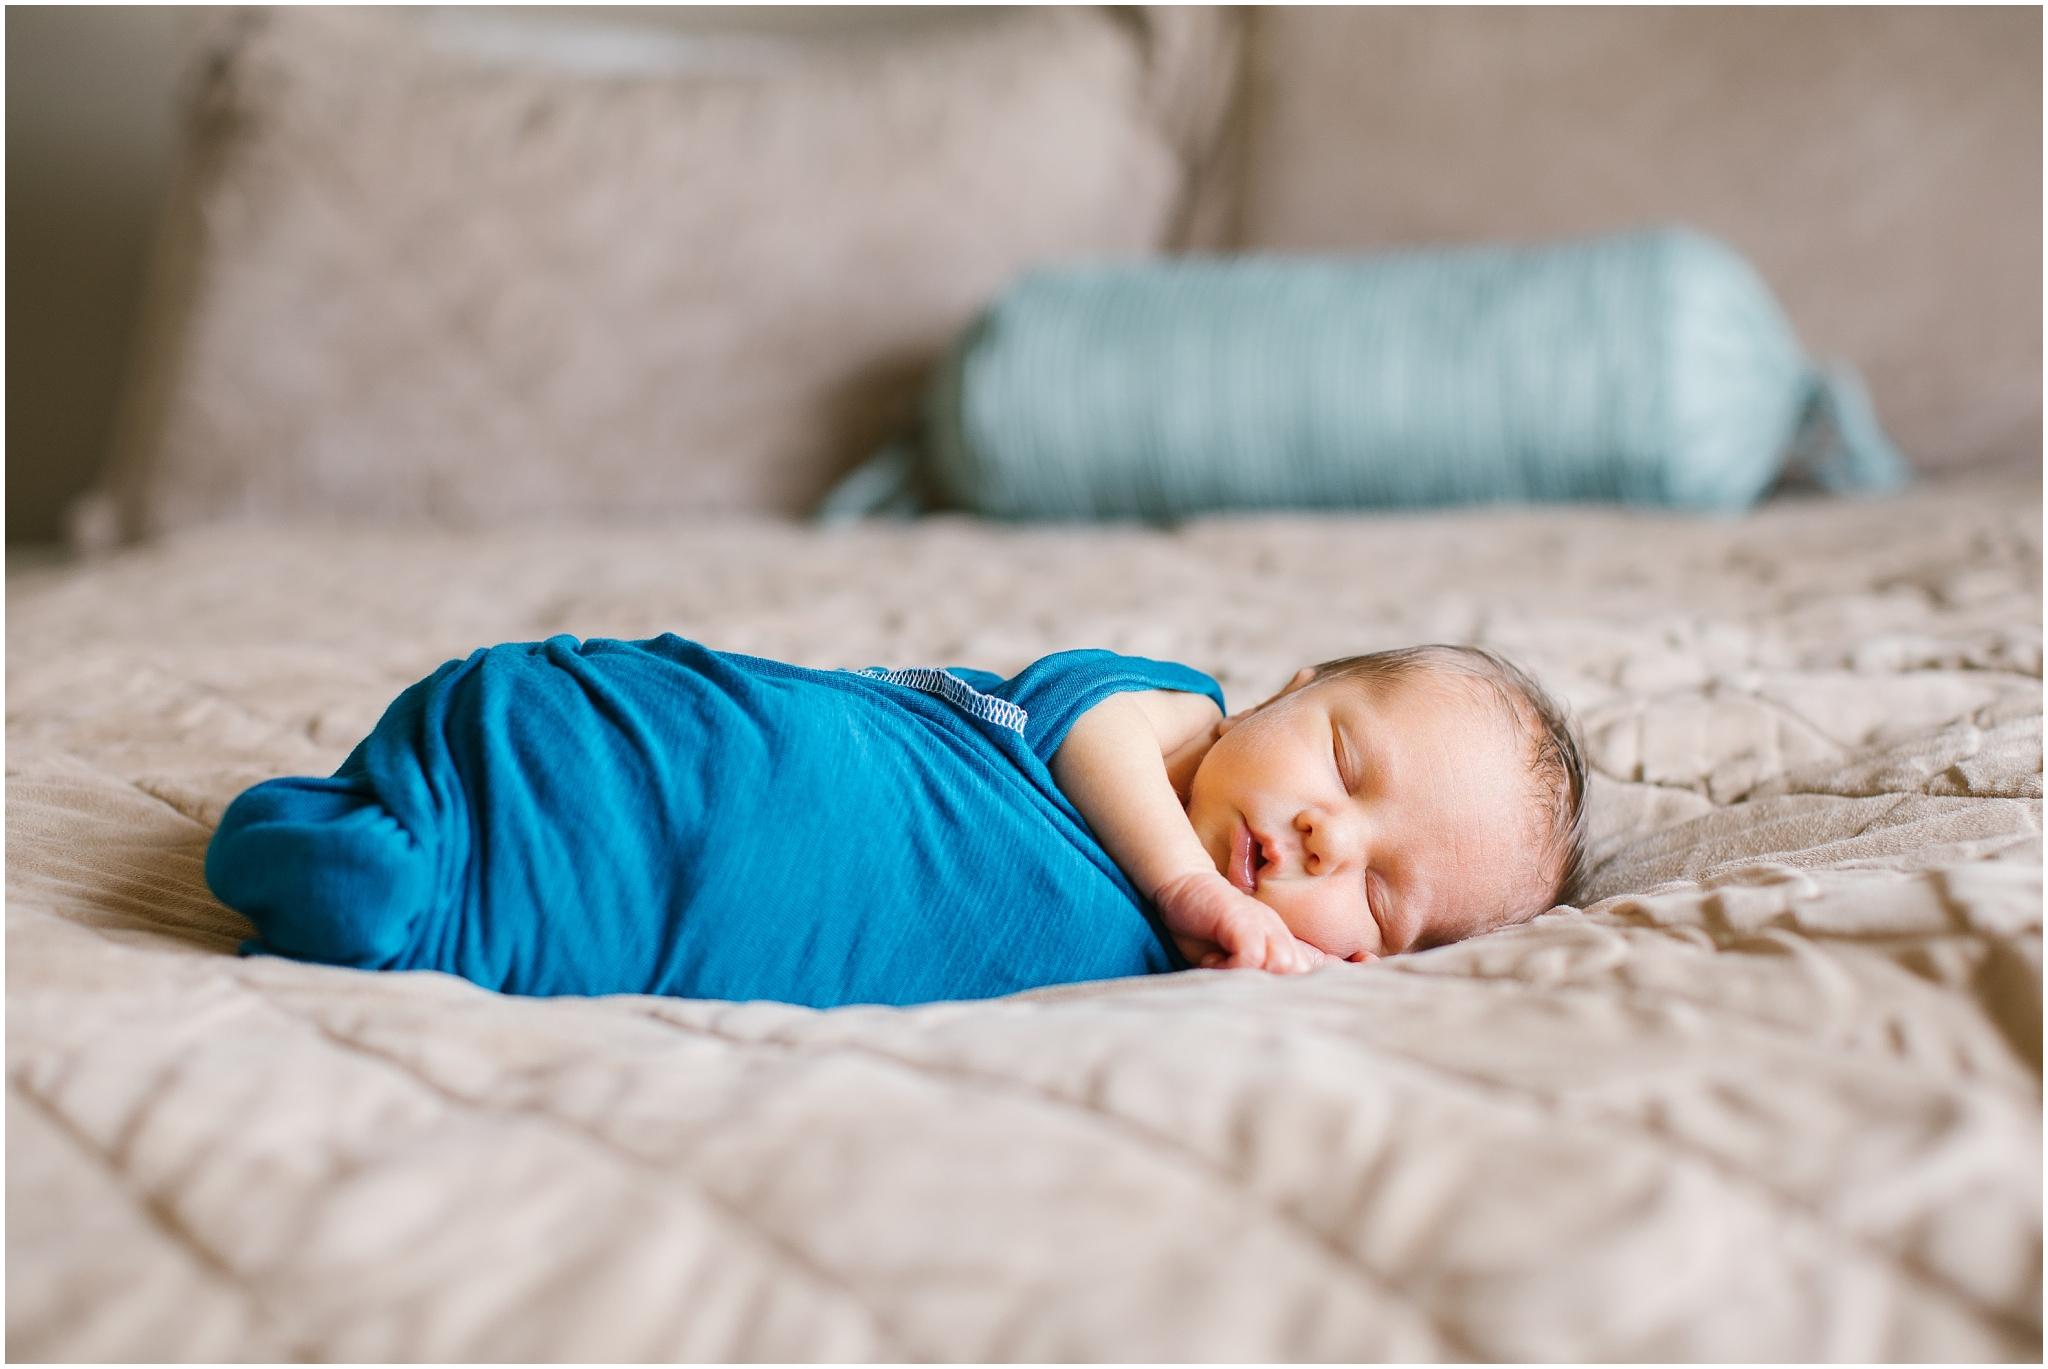 Marcus-114_Lizzie-B-Imagery-Utah-Family-Photographer-Salt-Lake-City-Park-City-Utah-County-Lifestyle-Newborn-Session.jpg